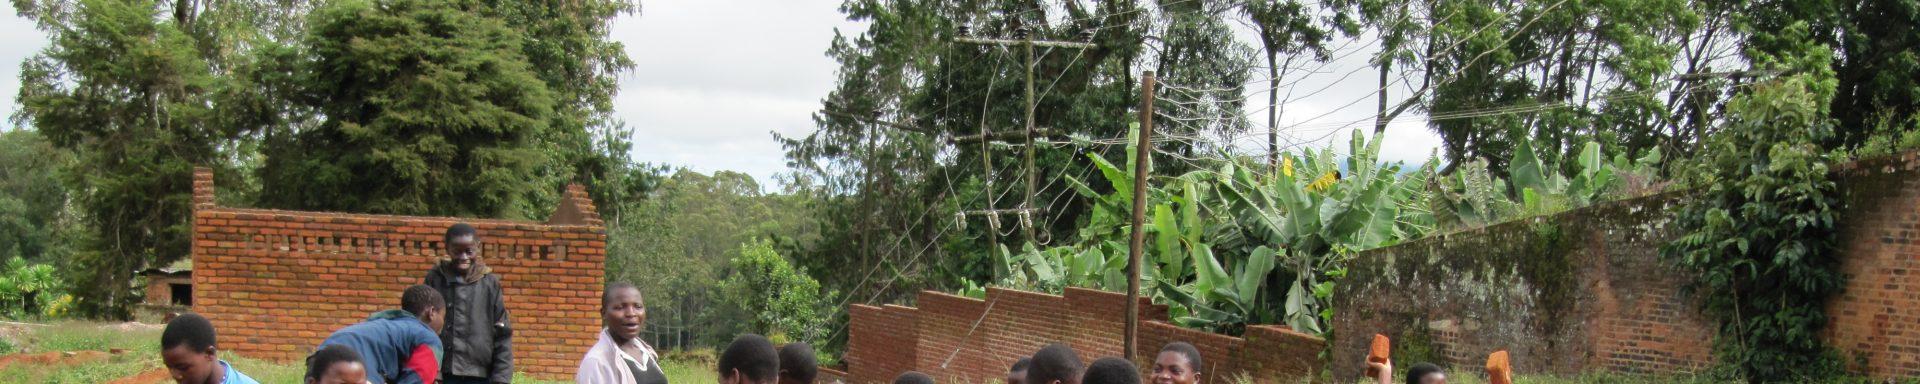 Vrouwen met bakstenen in Malawi